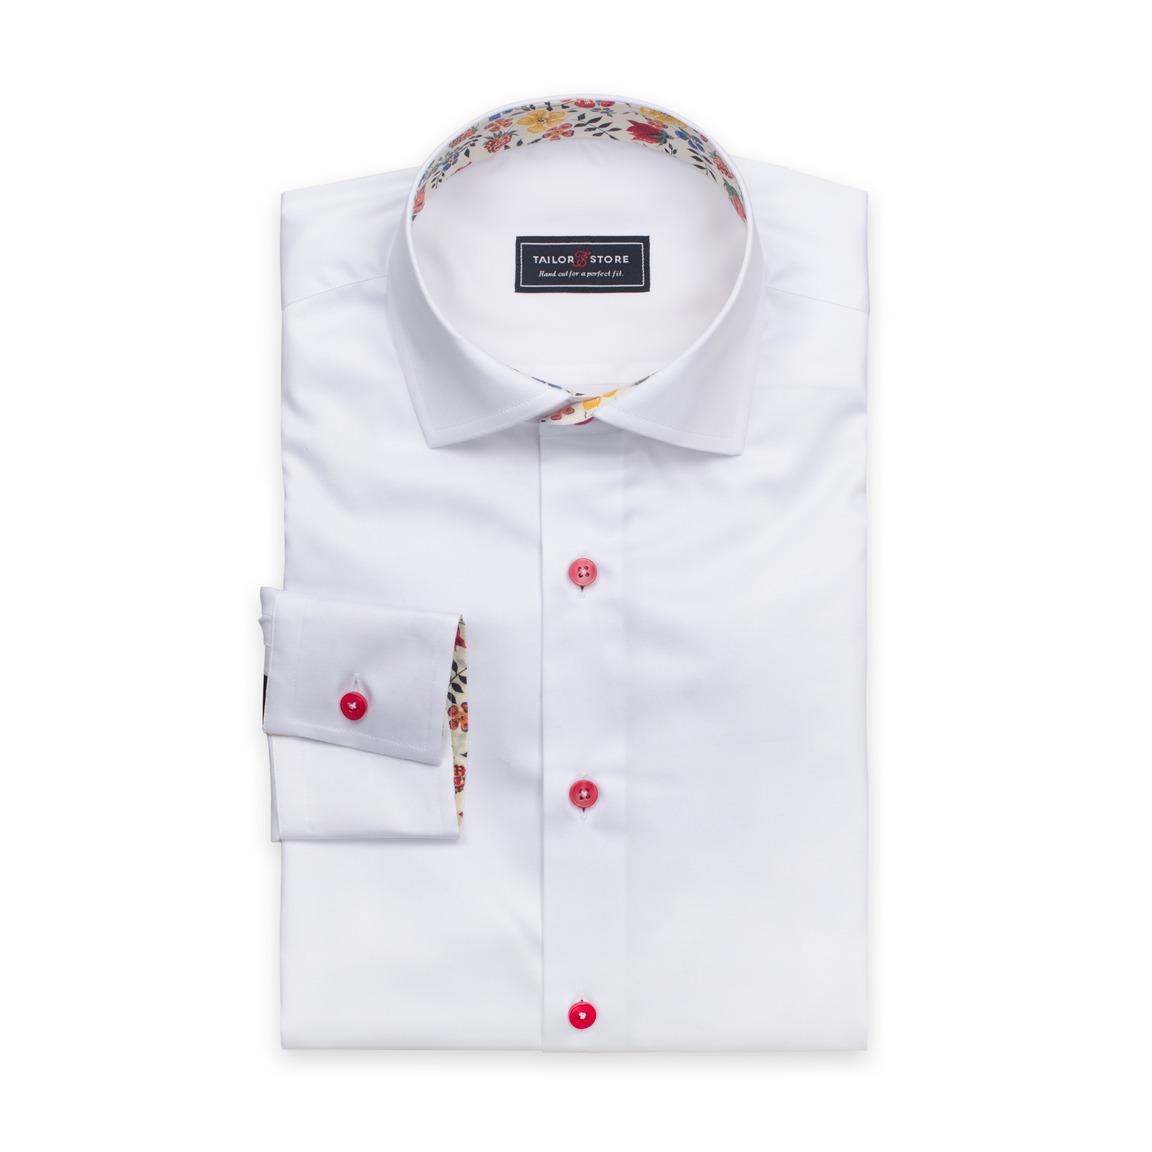 Hvit dresskjorte med røde knapper og kontraster